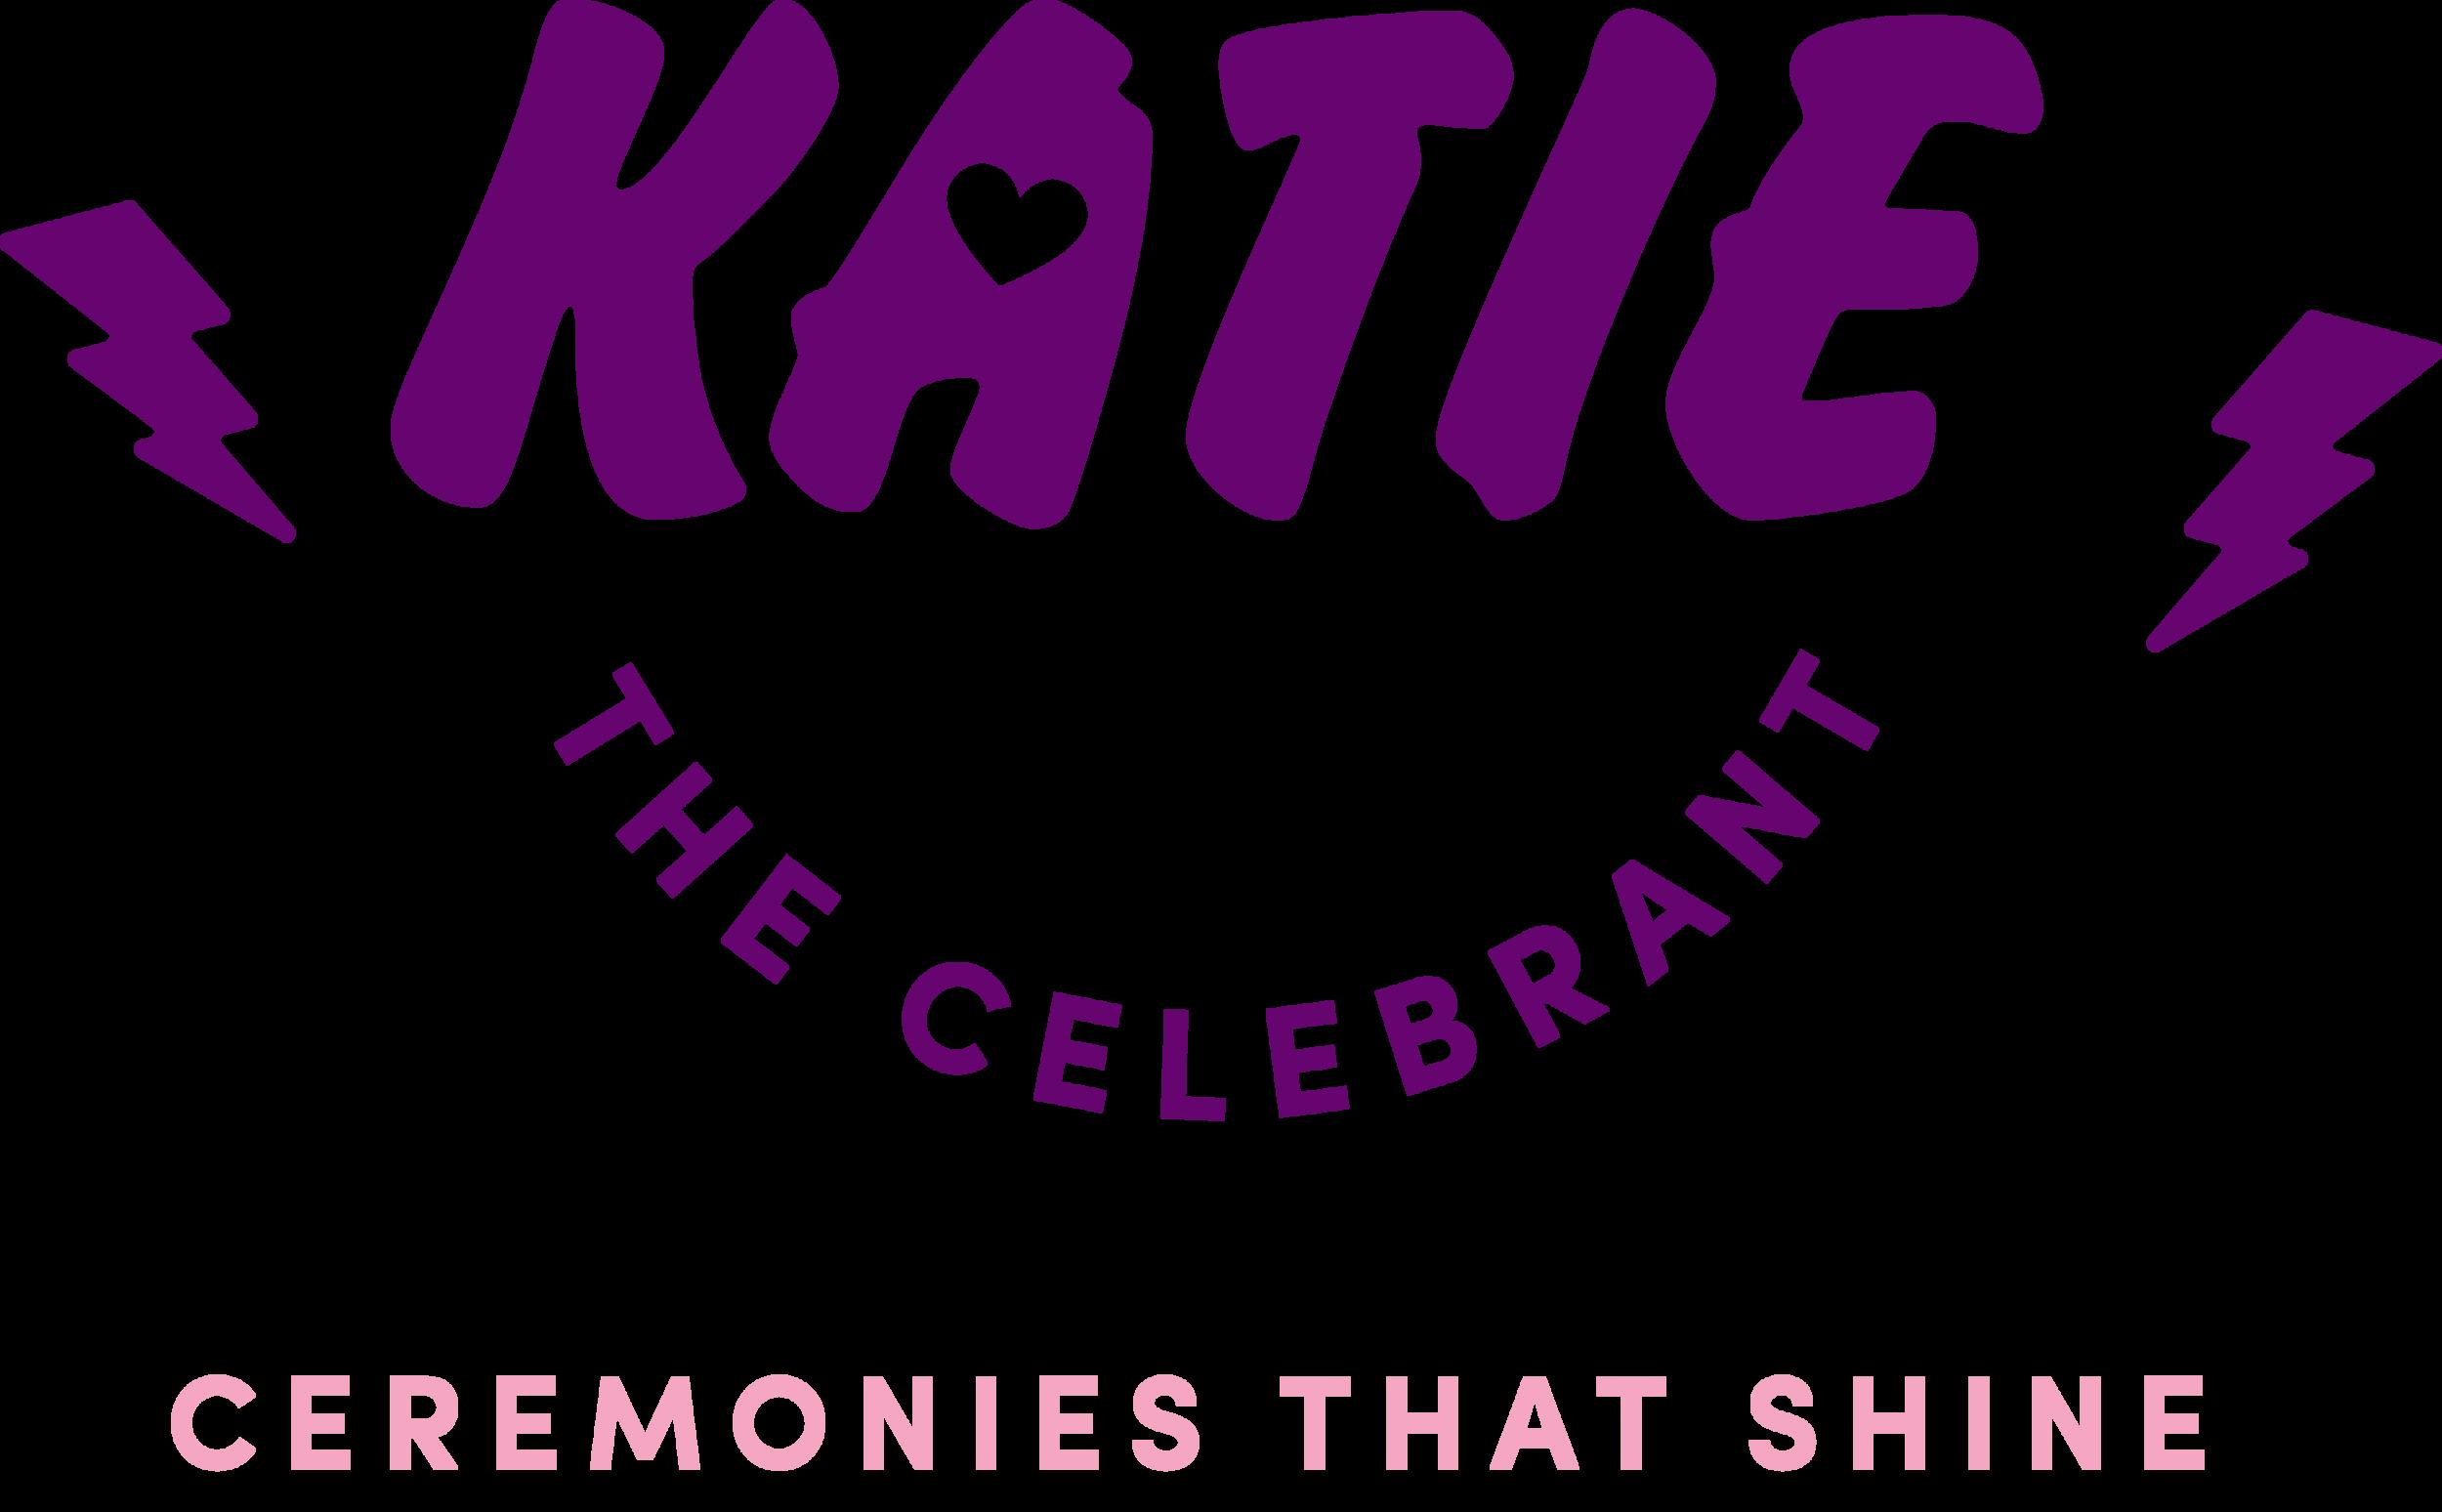 Katie the celebrant logo